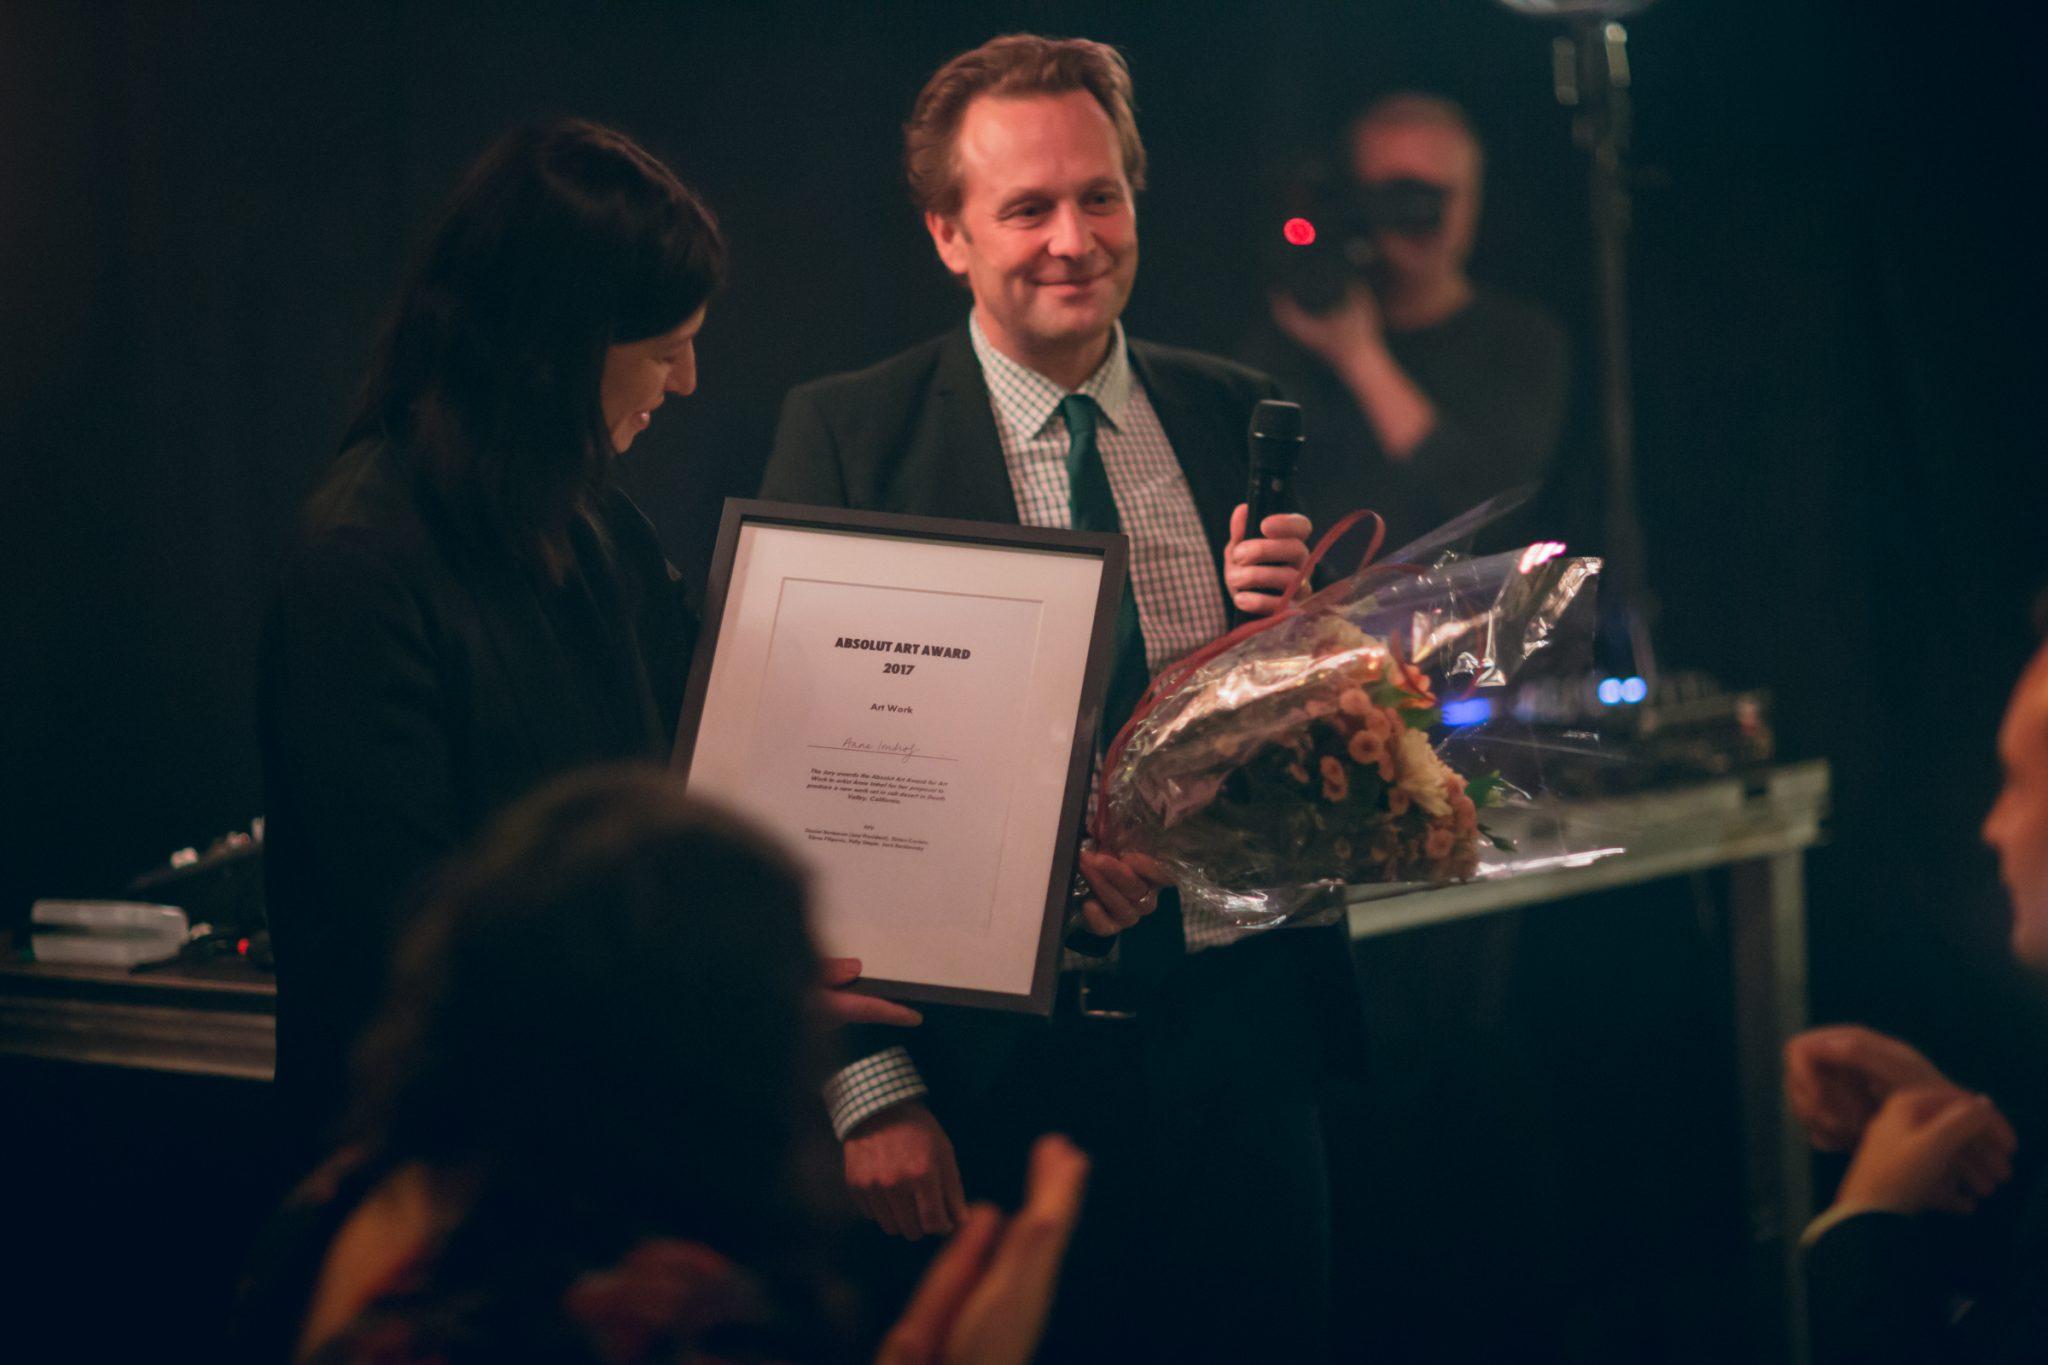 2017 Absolut Art Award Jury President, Daniel Birnbaum with Art Work winner Anne Imhof FAD Magazine